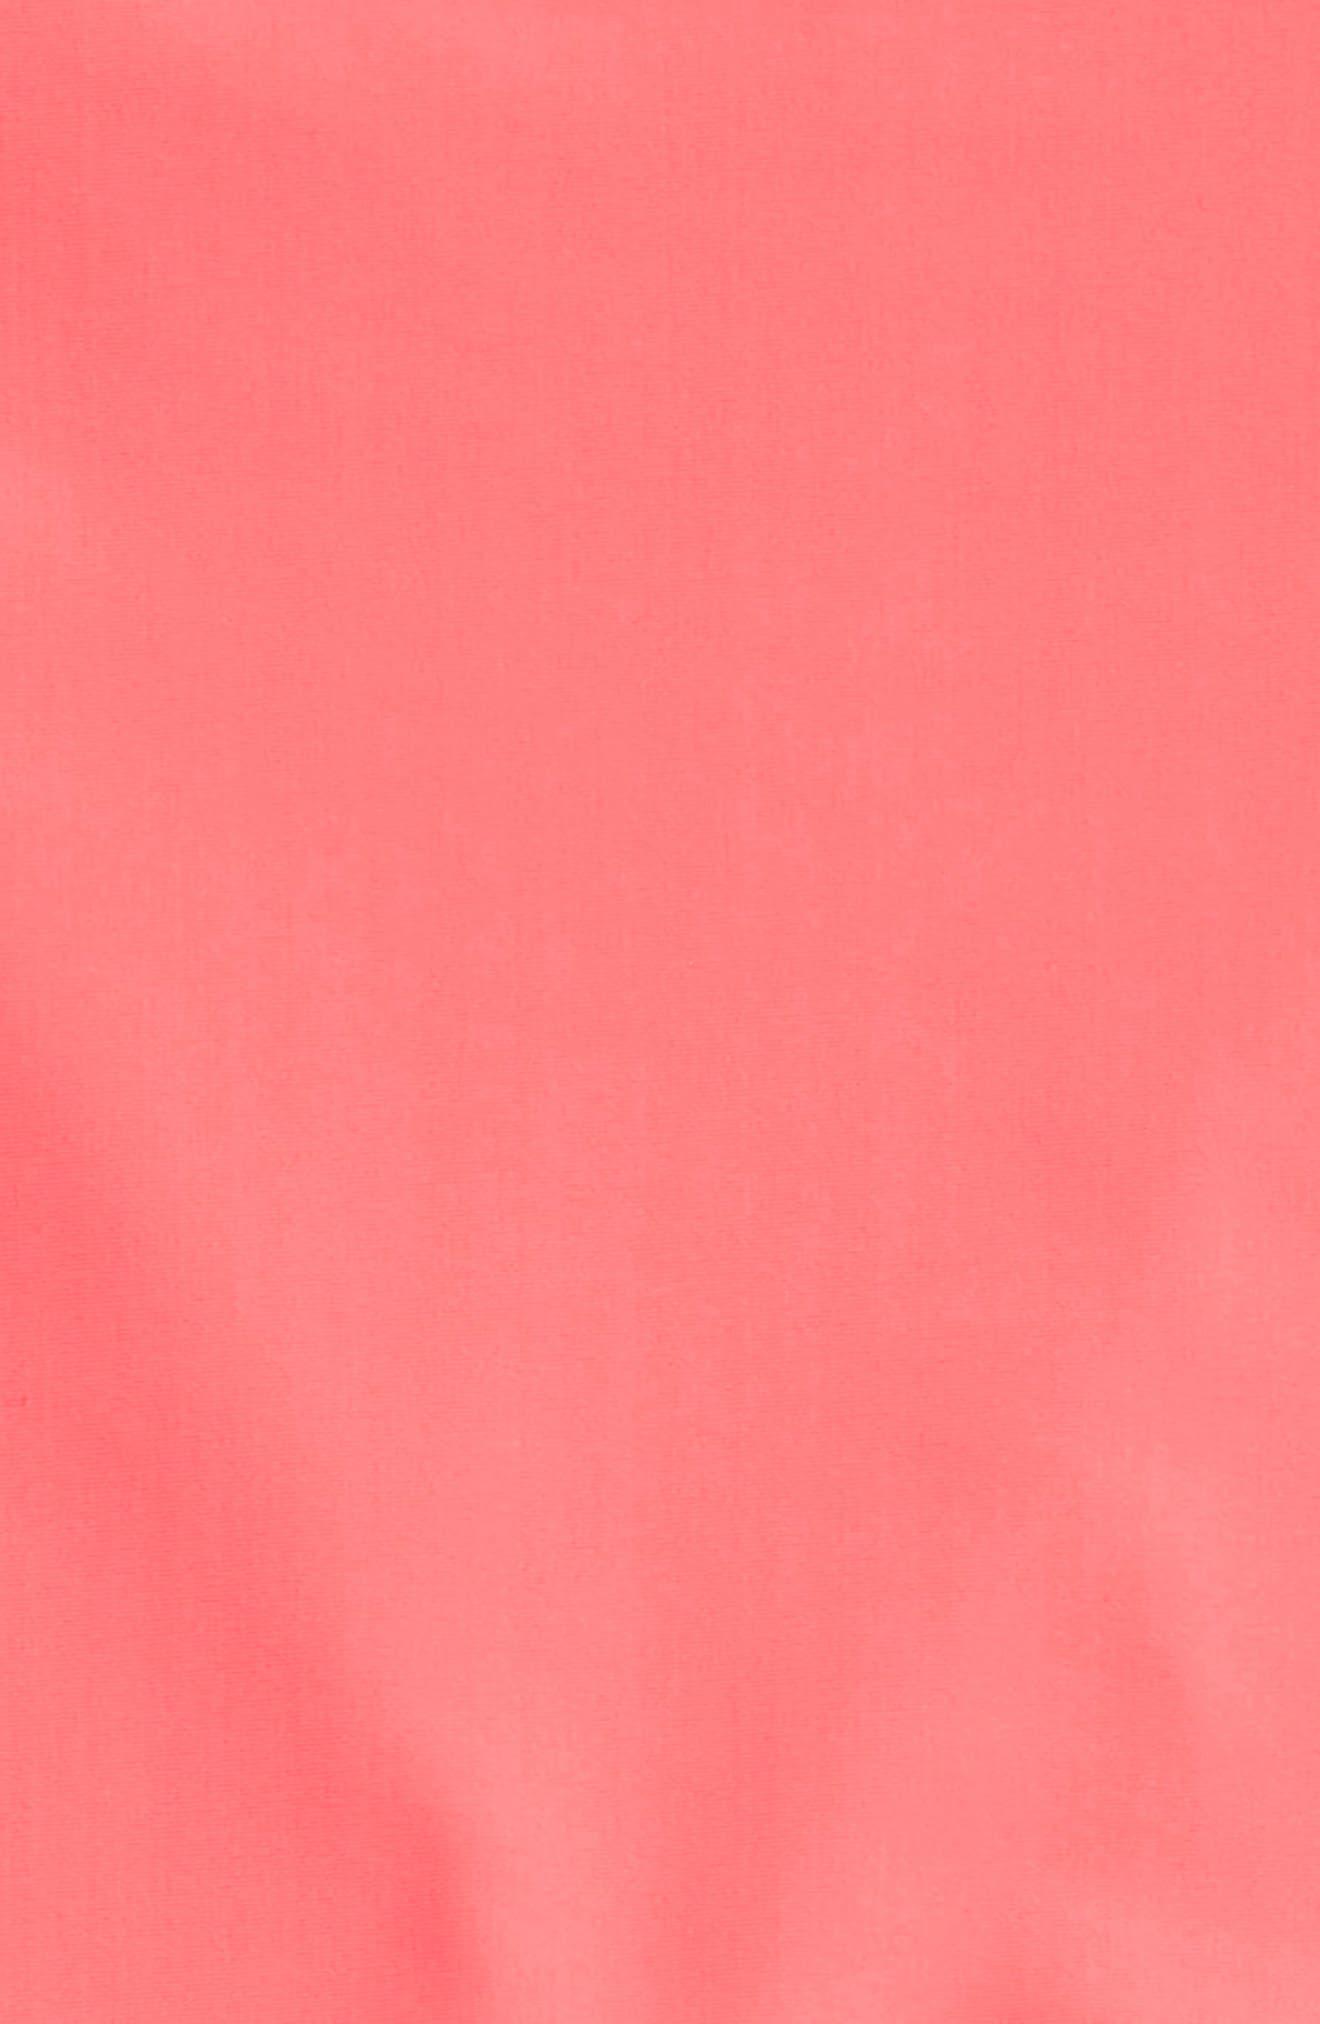 Sandine One-Piece Swimsuit,                             Alternate thumbnail 3, color,                             950